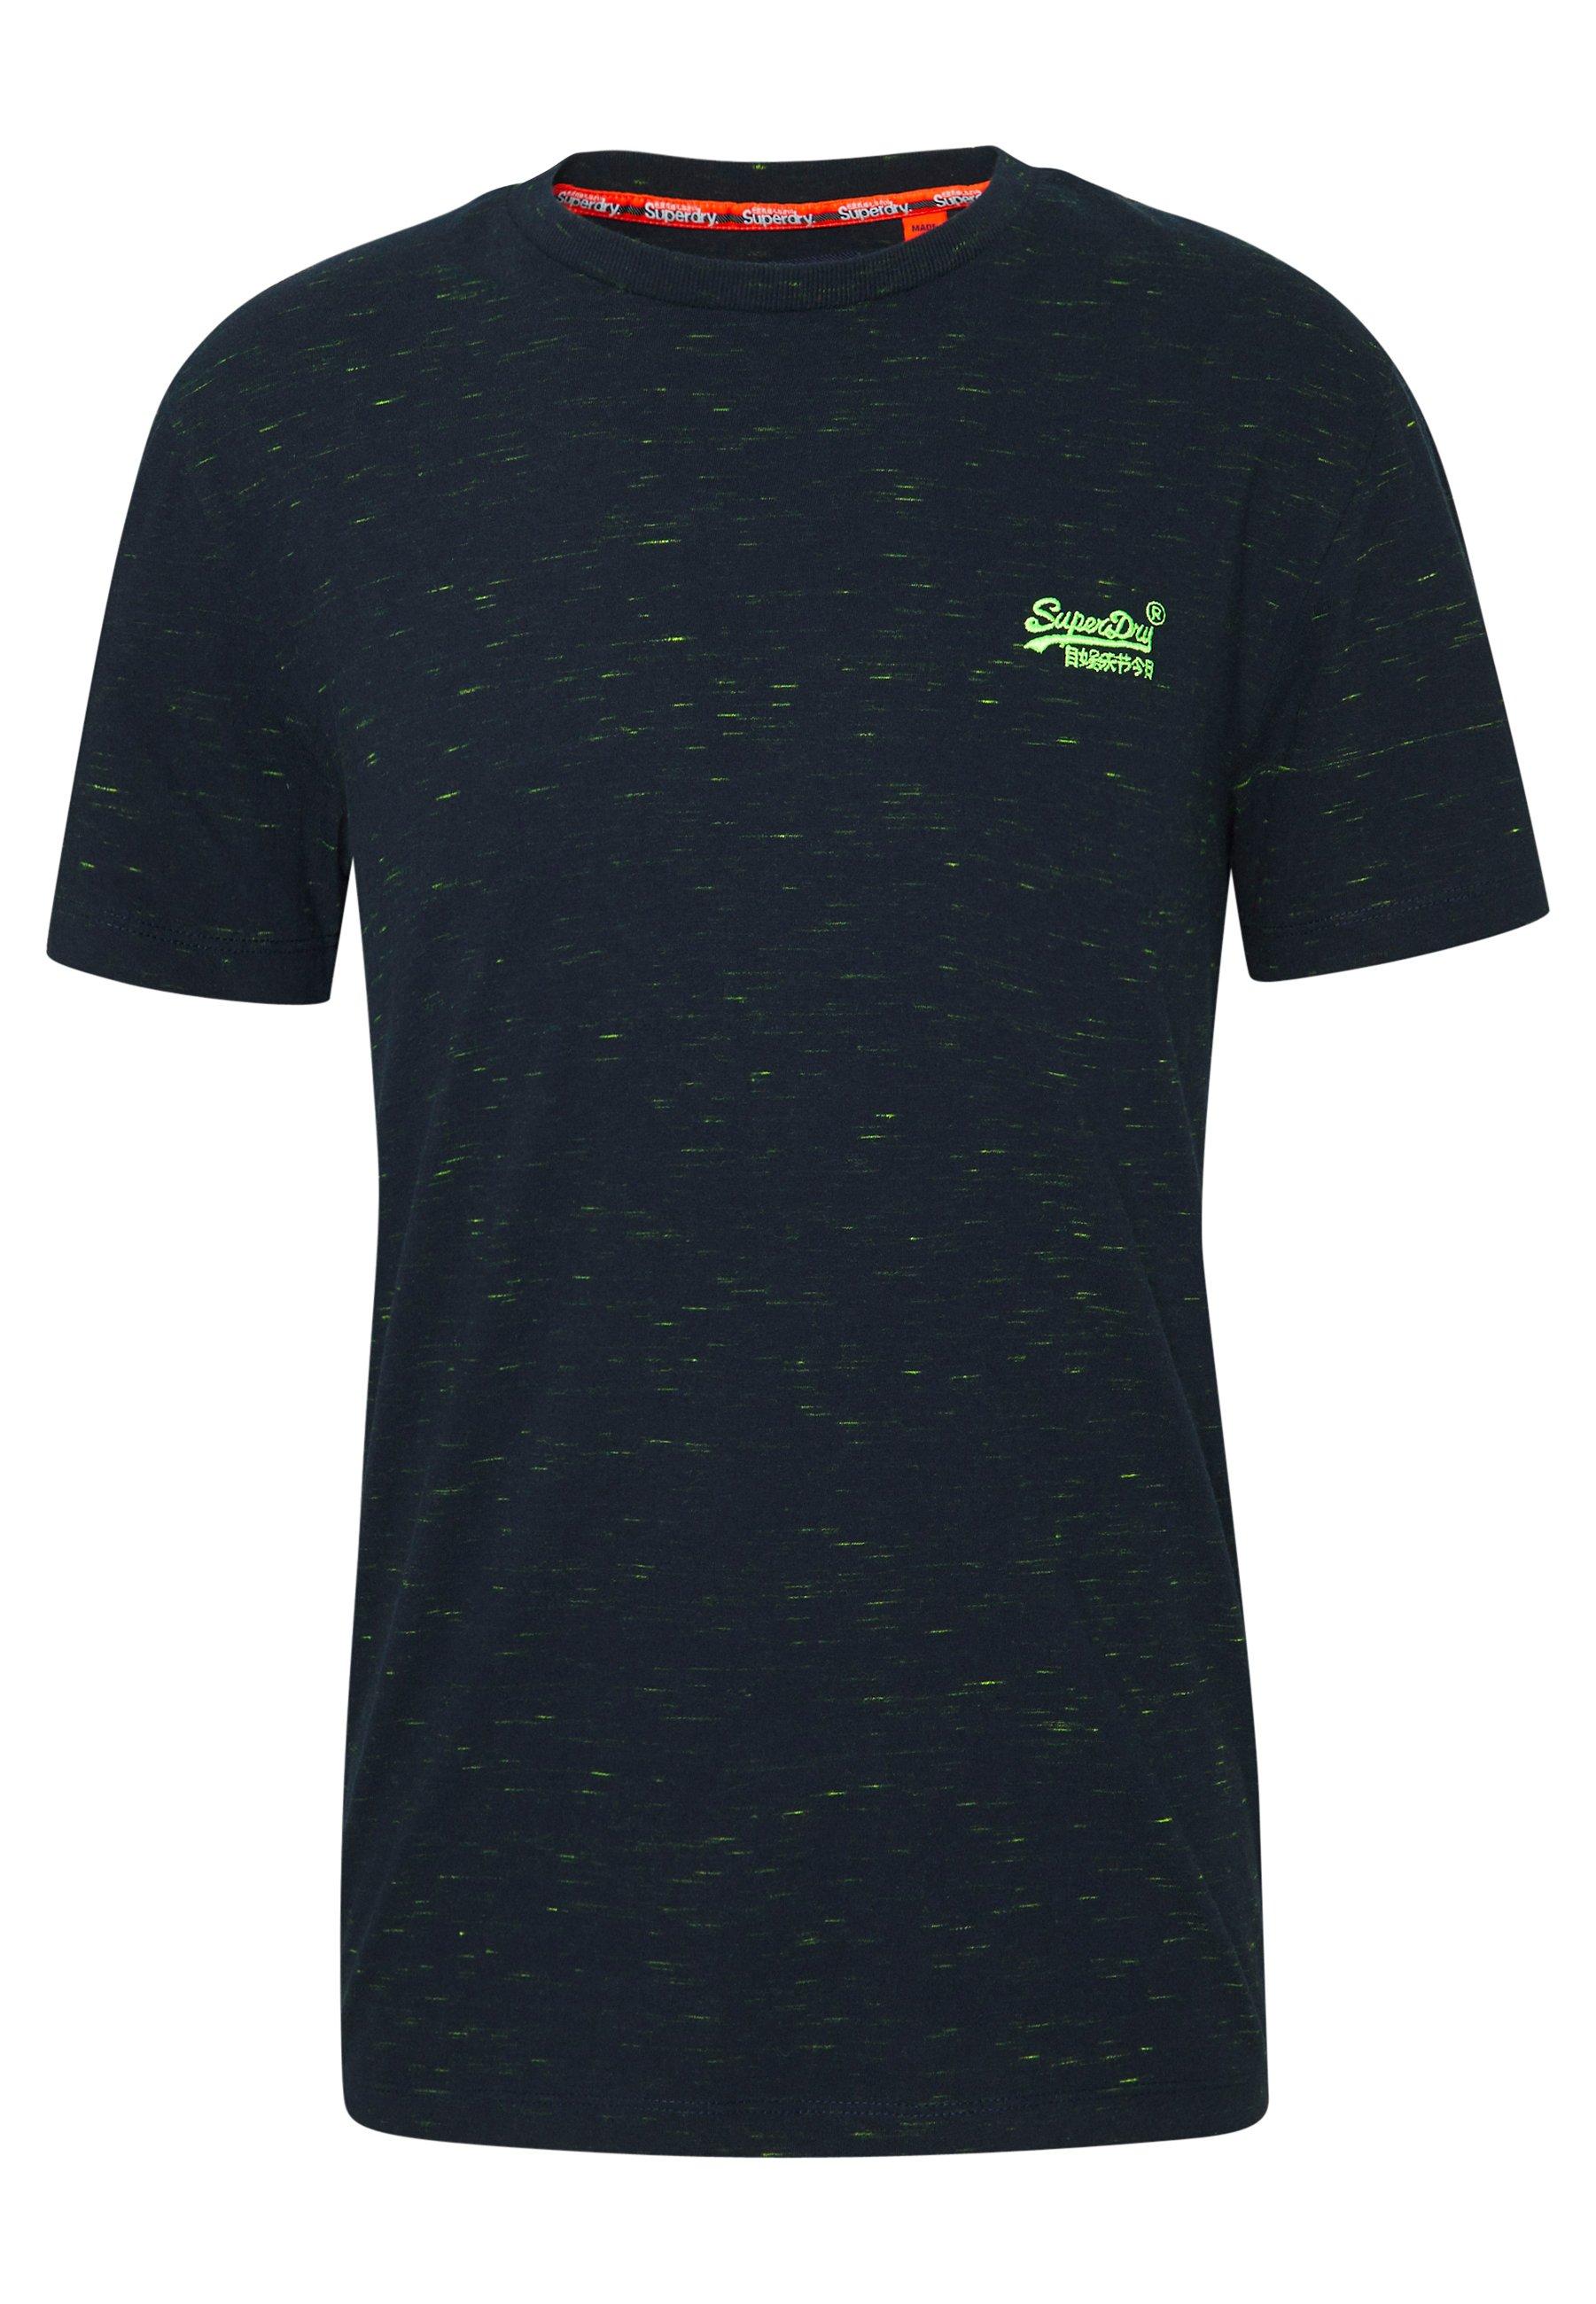 Superdry Vintage Crew - T-shirts Navy